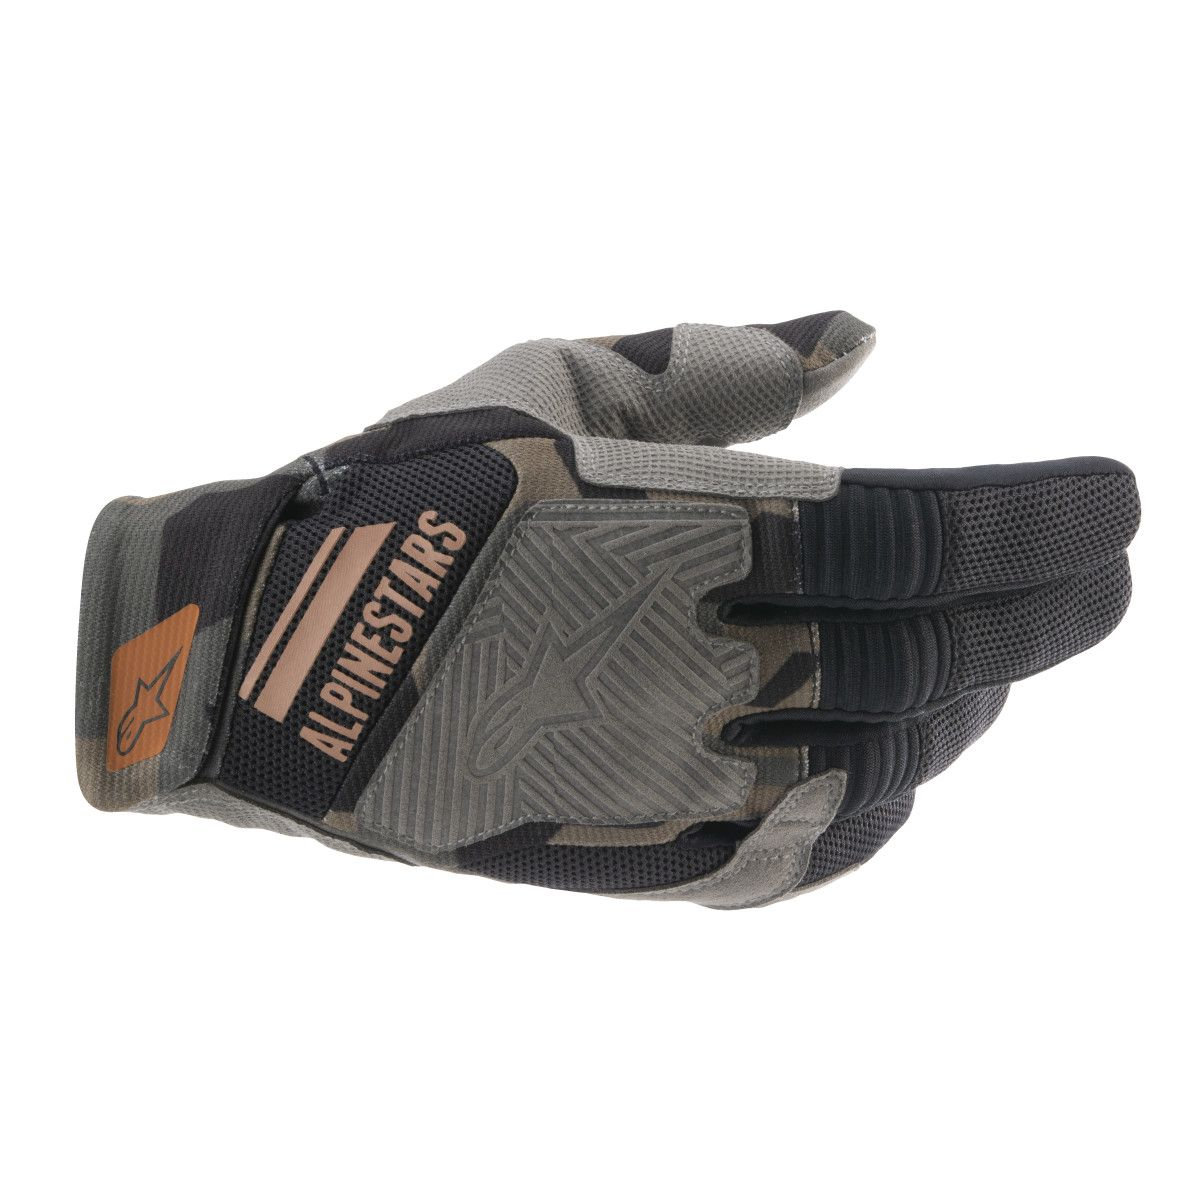 Alpinestars Venture R Enduro Handschoenen Sand Camo